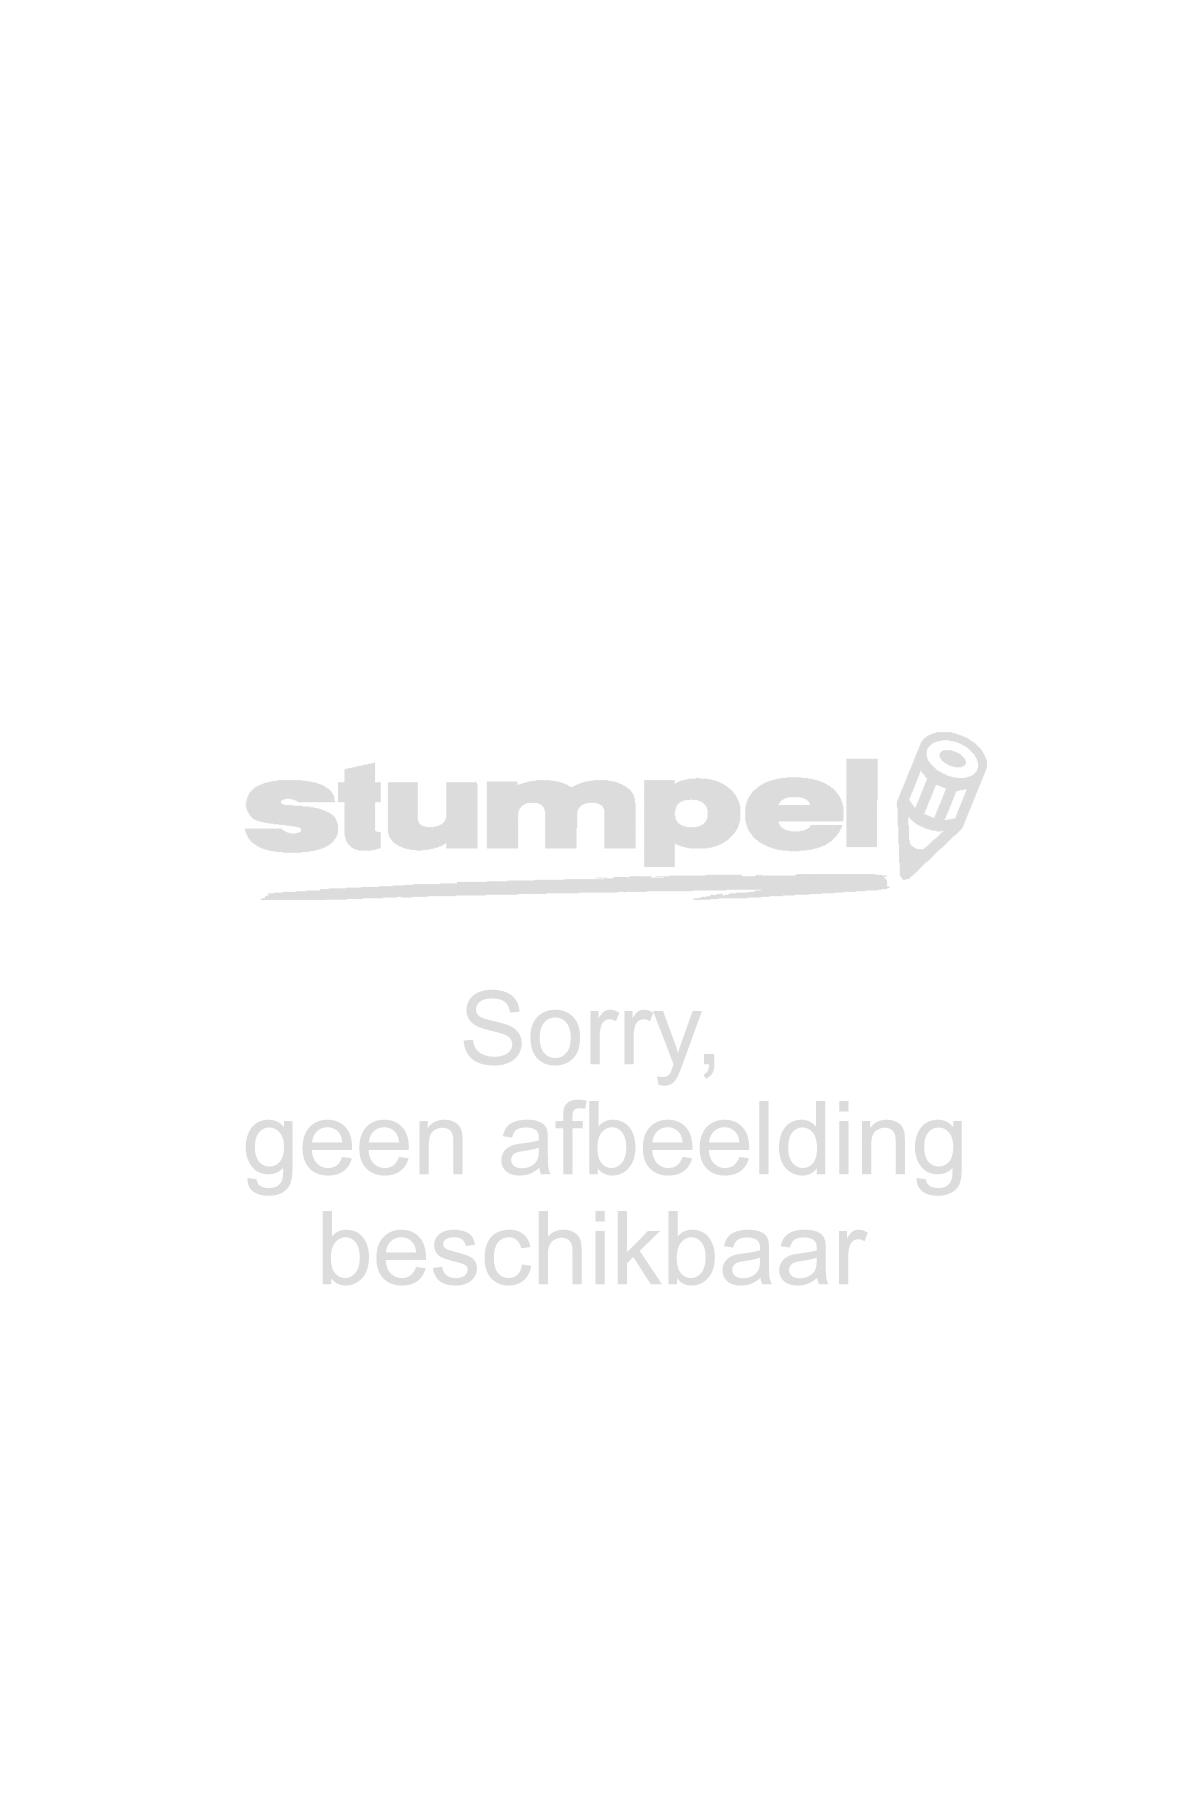 bookaroo-brillenhoes-met-elastiek-paars-10968861